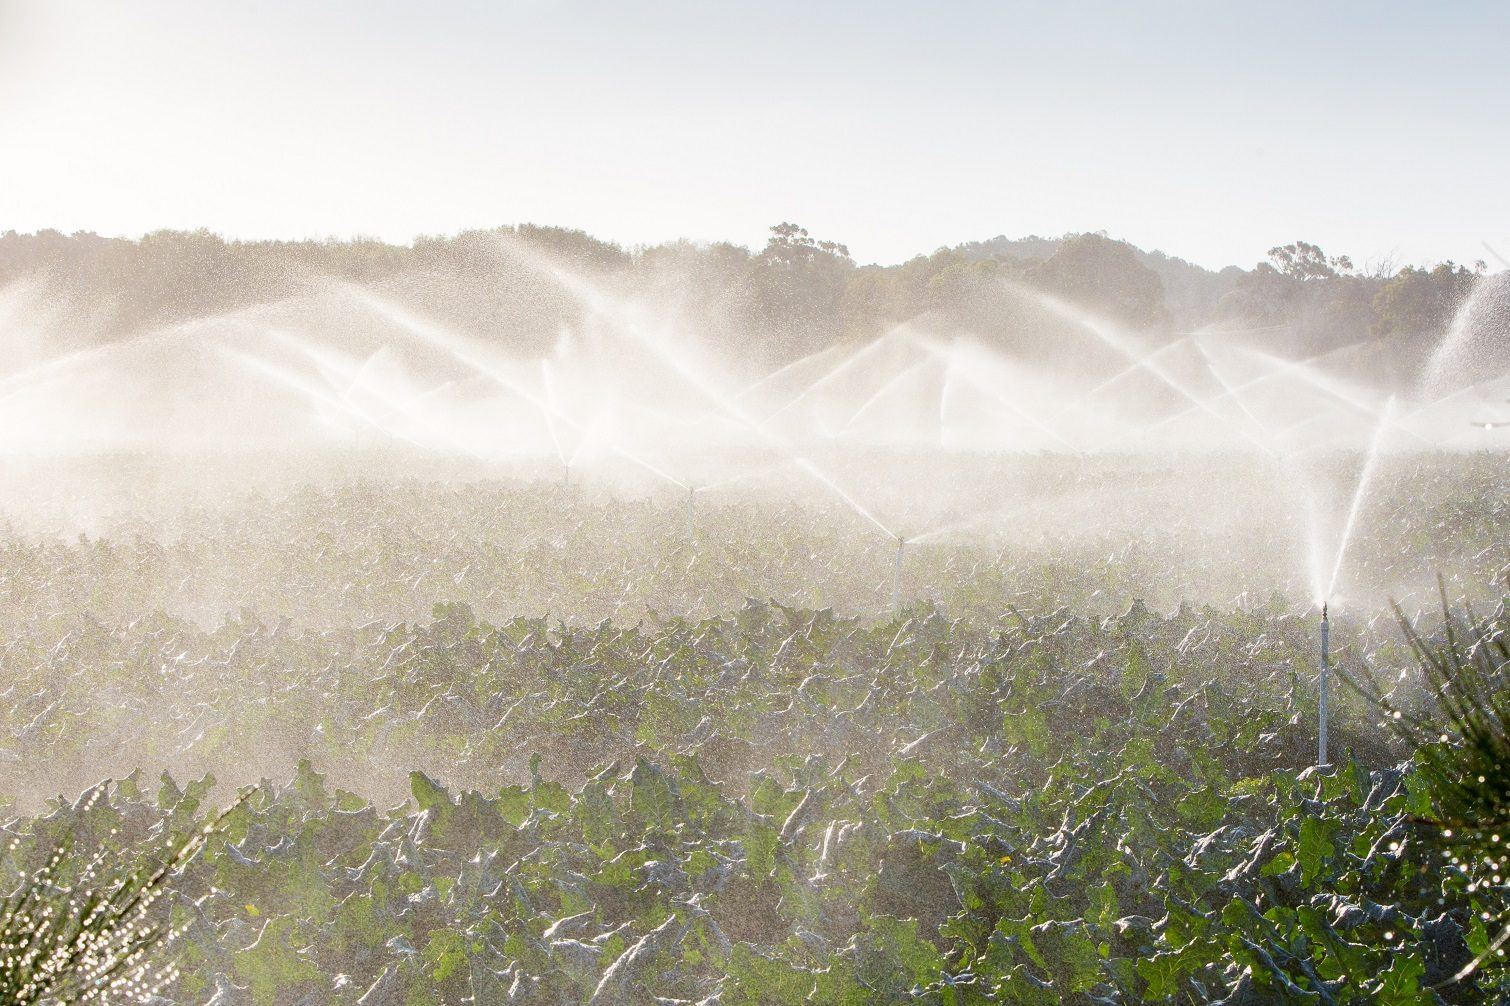 Crop sprayers in action in Mornington Peninsula, Victoria, Australia